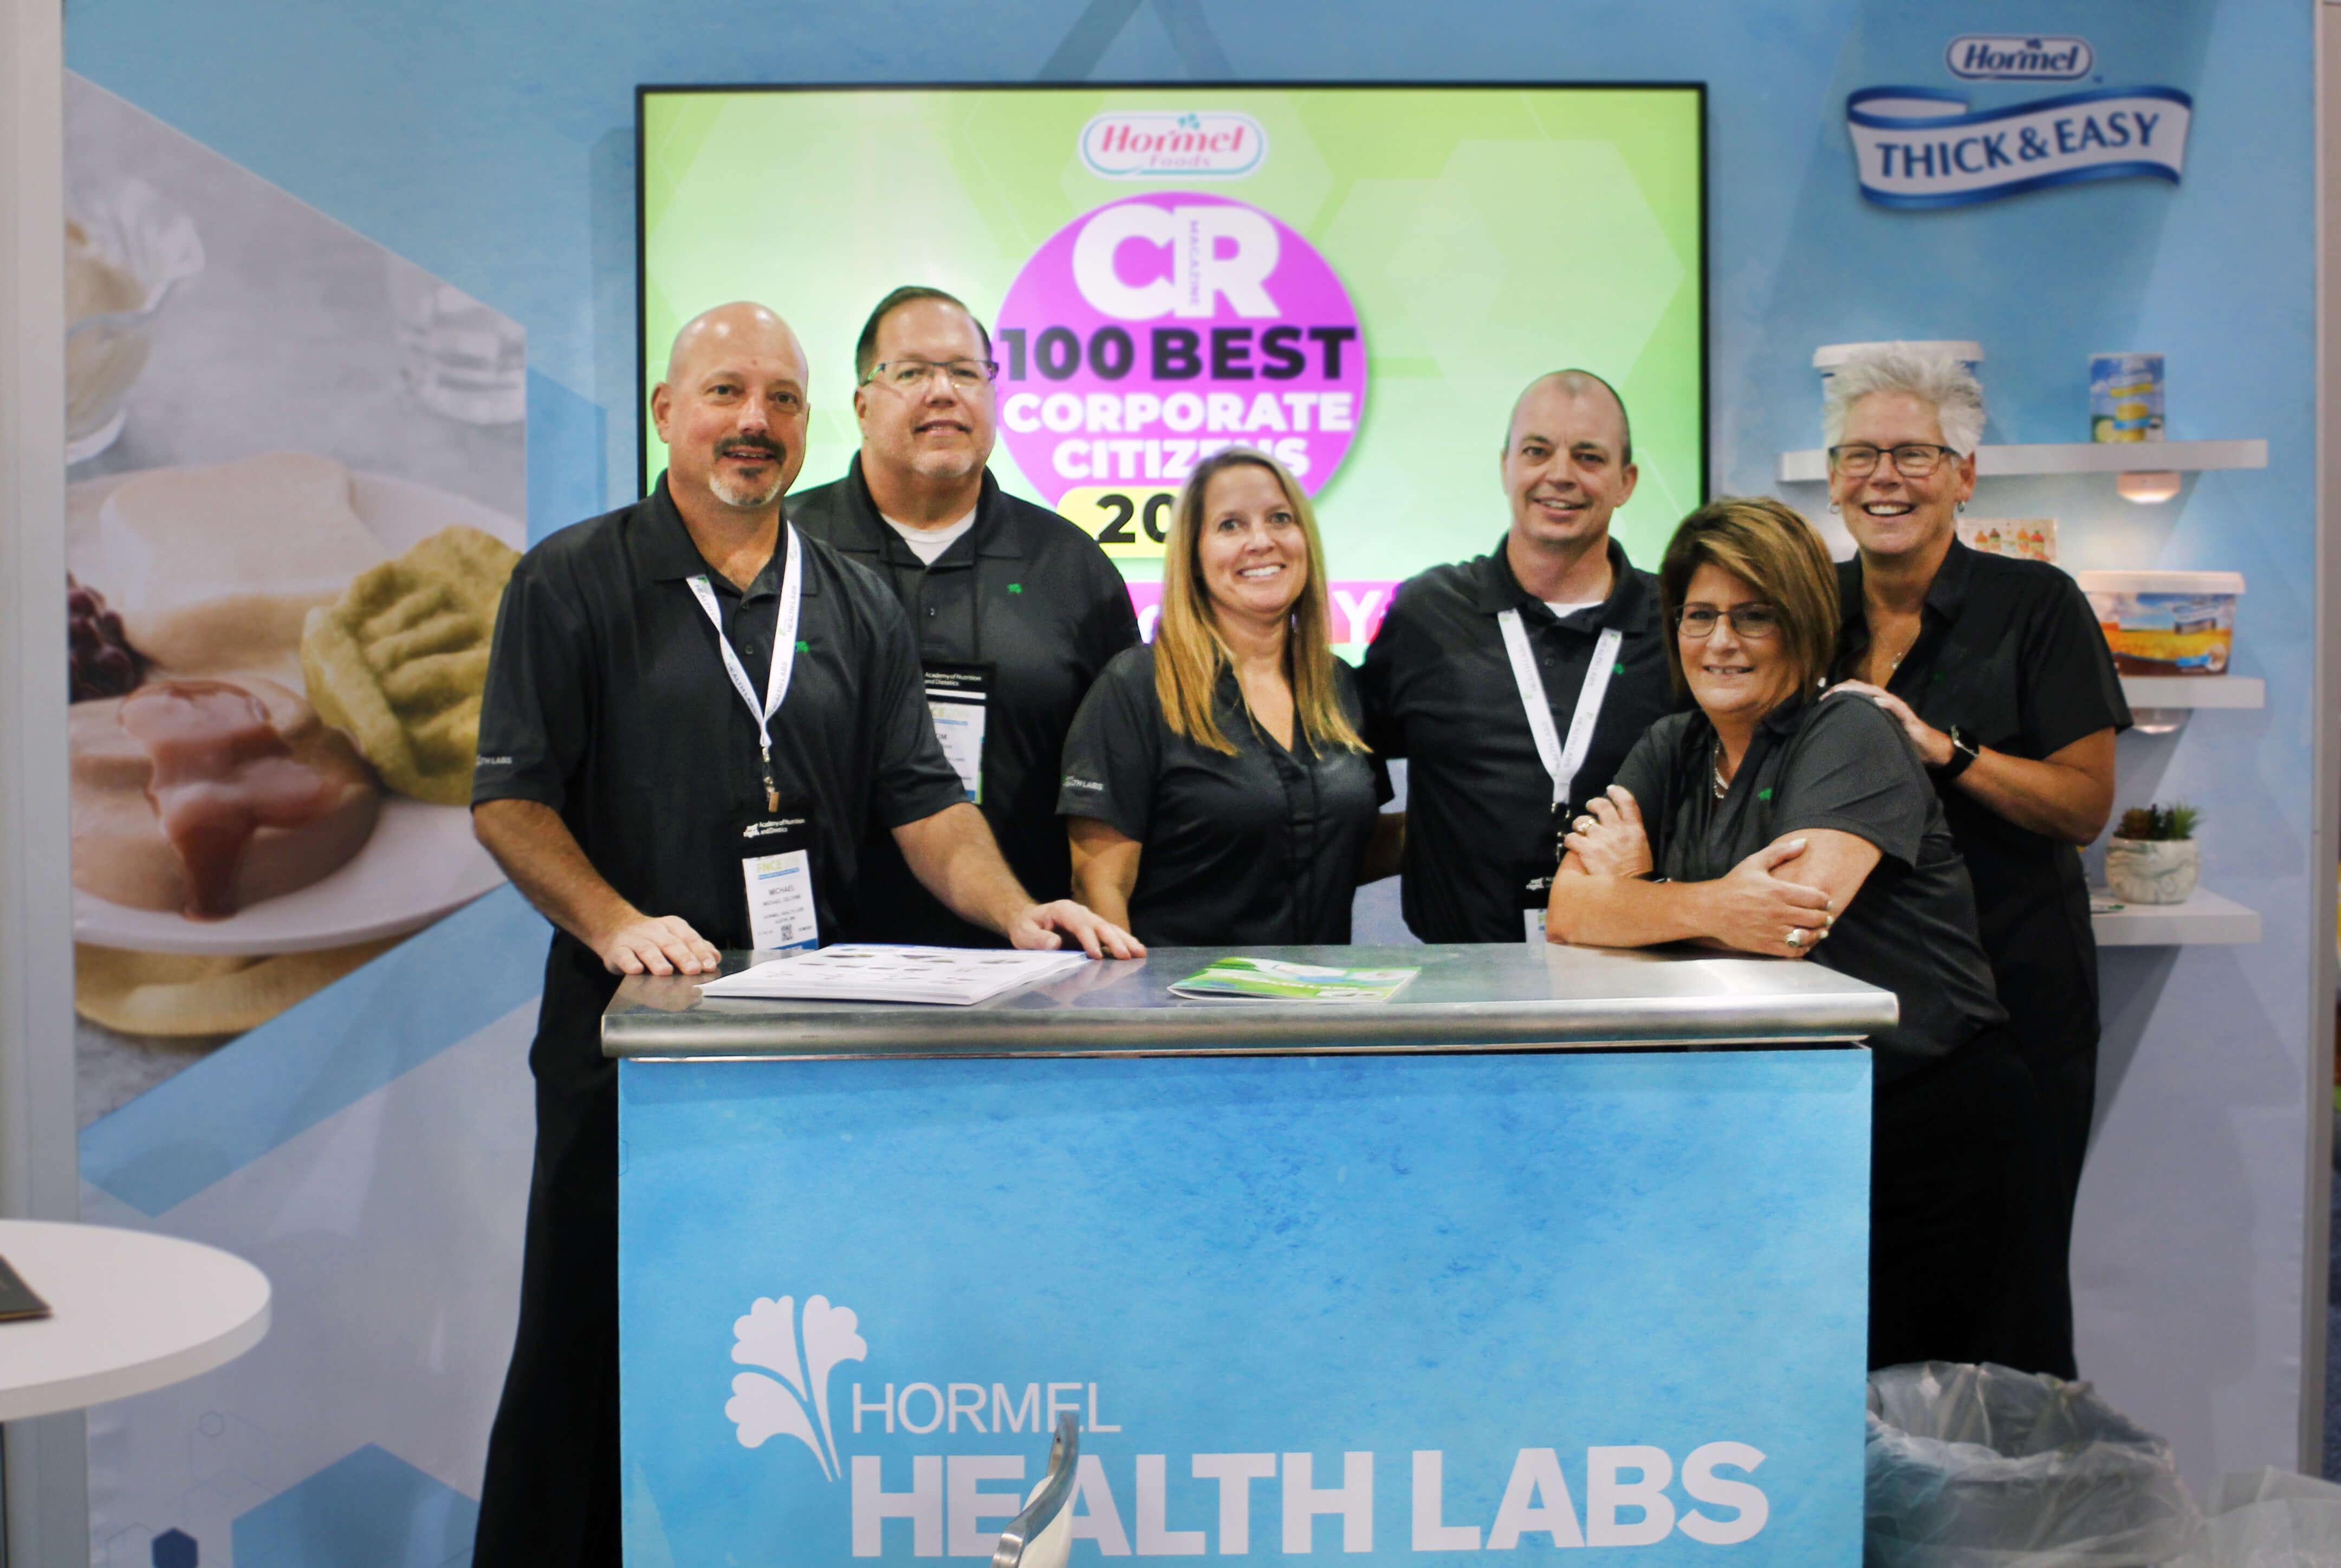 Hormel Health Labs team at FNCE